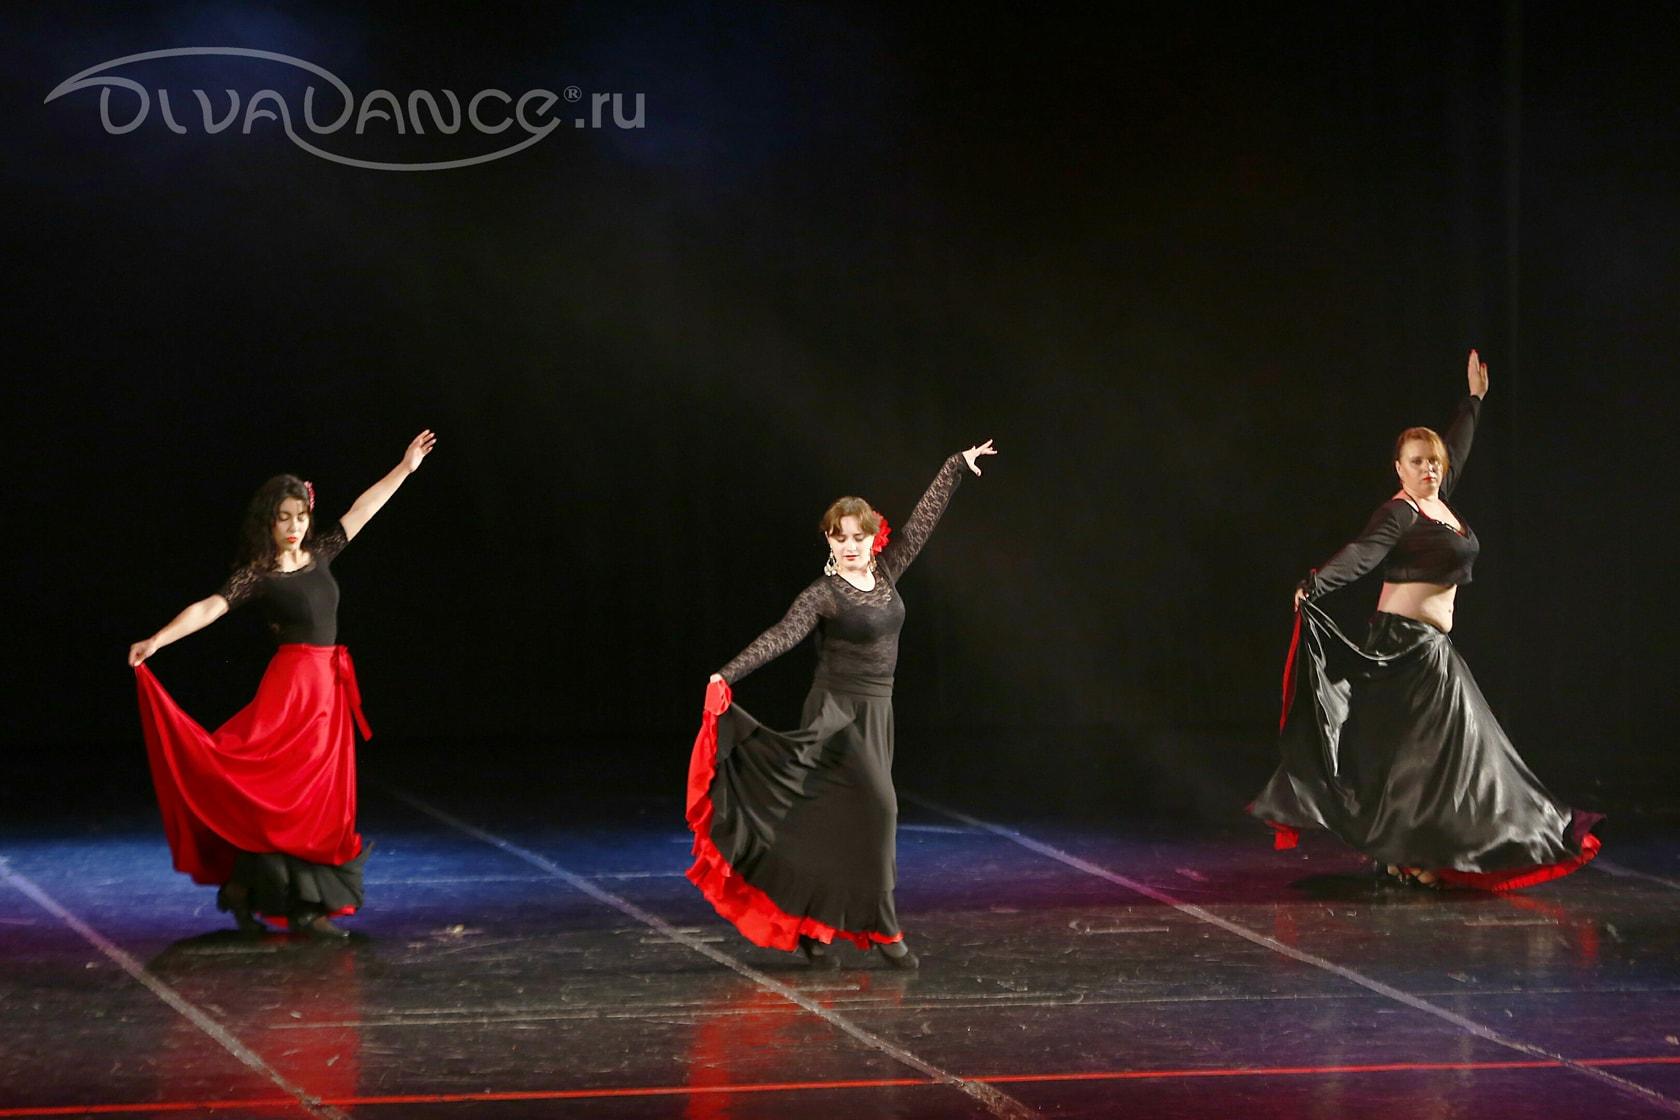 Музыкальную программу для танцев